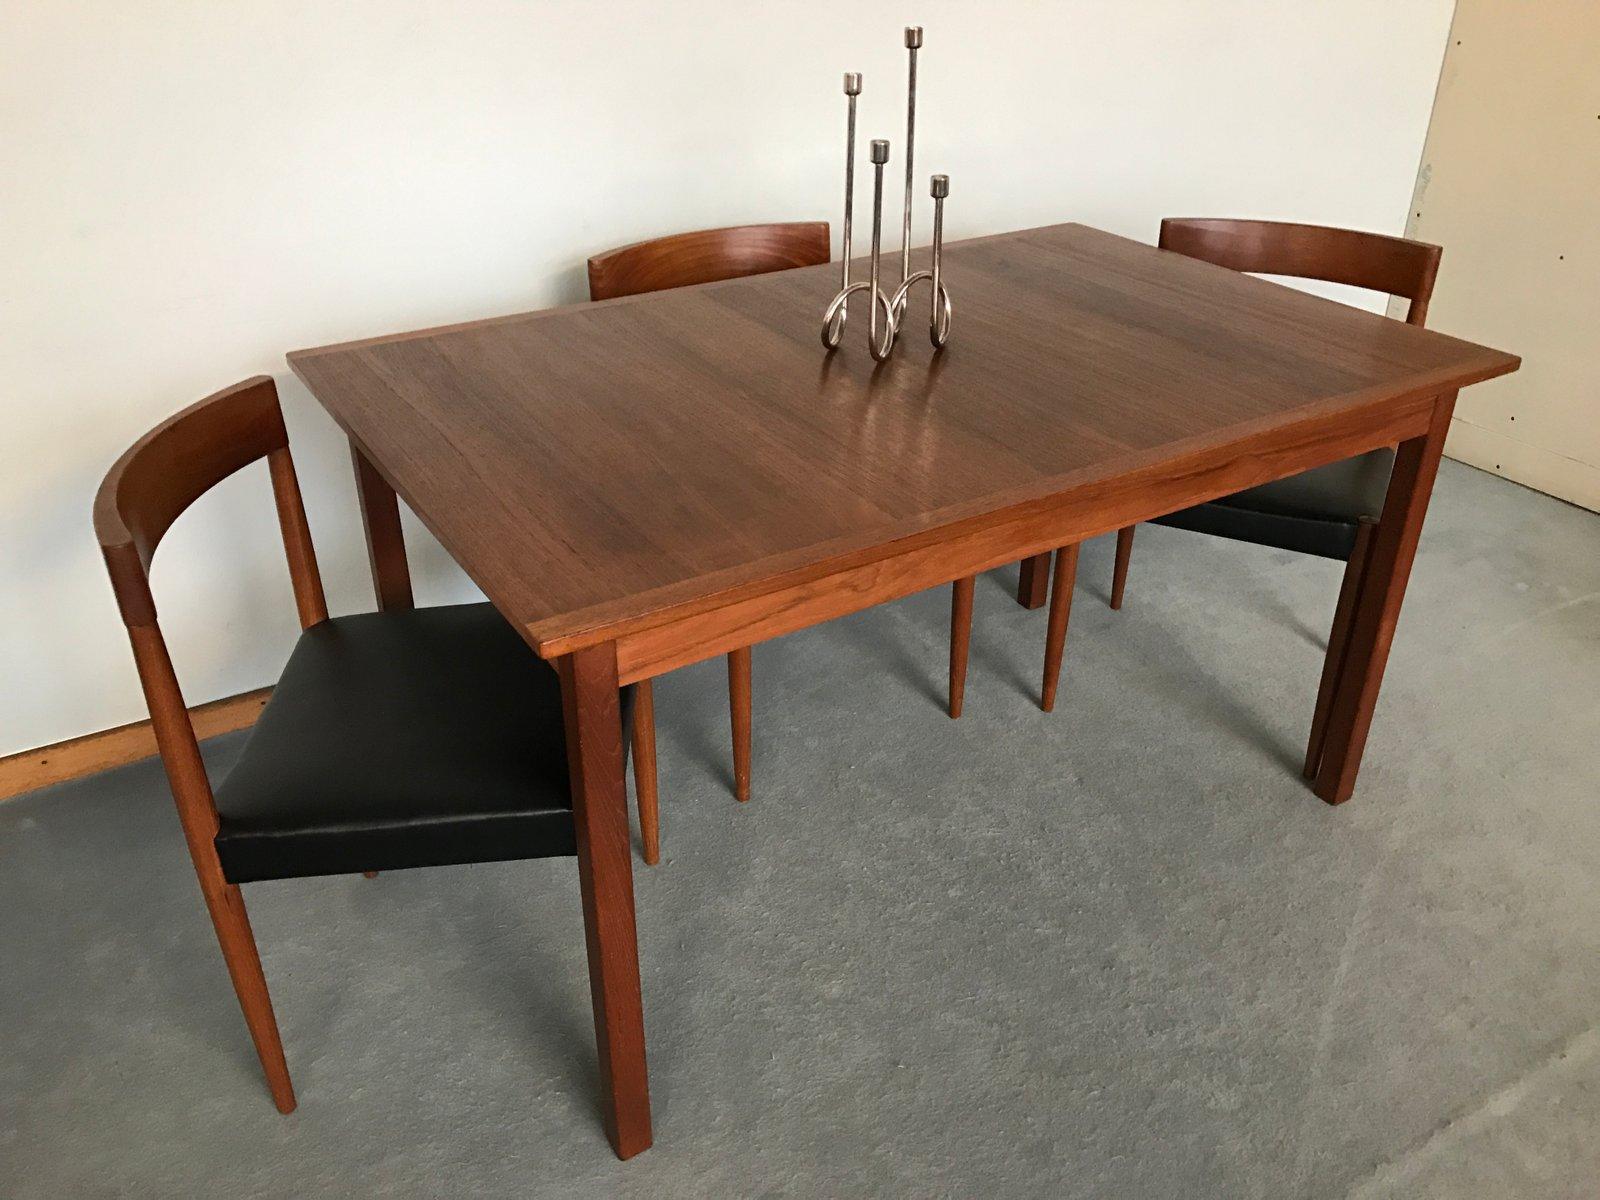 Vintage Scandinavian Teak Dining Table By Nils Jonsson For